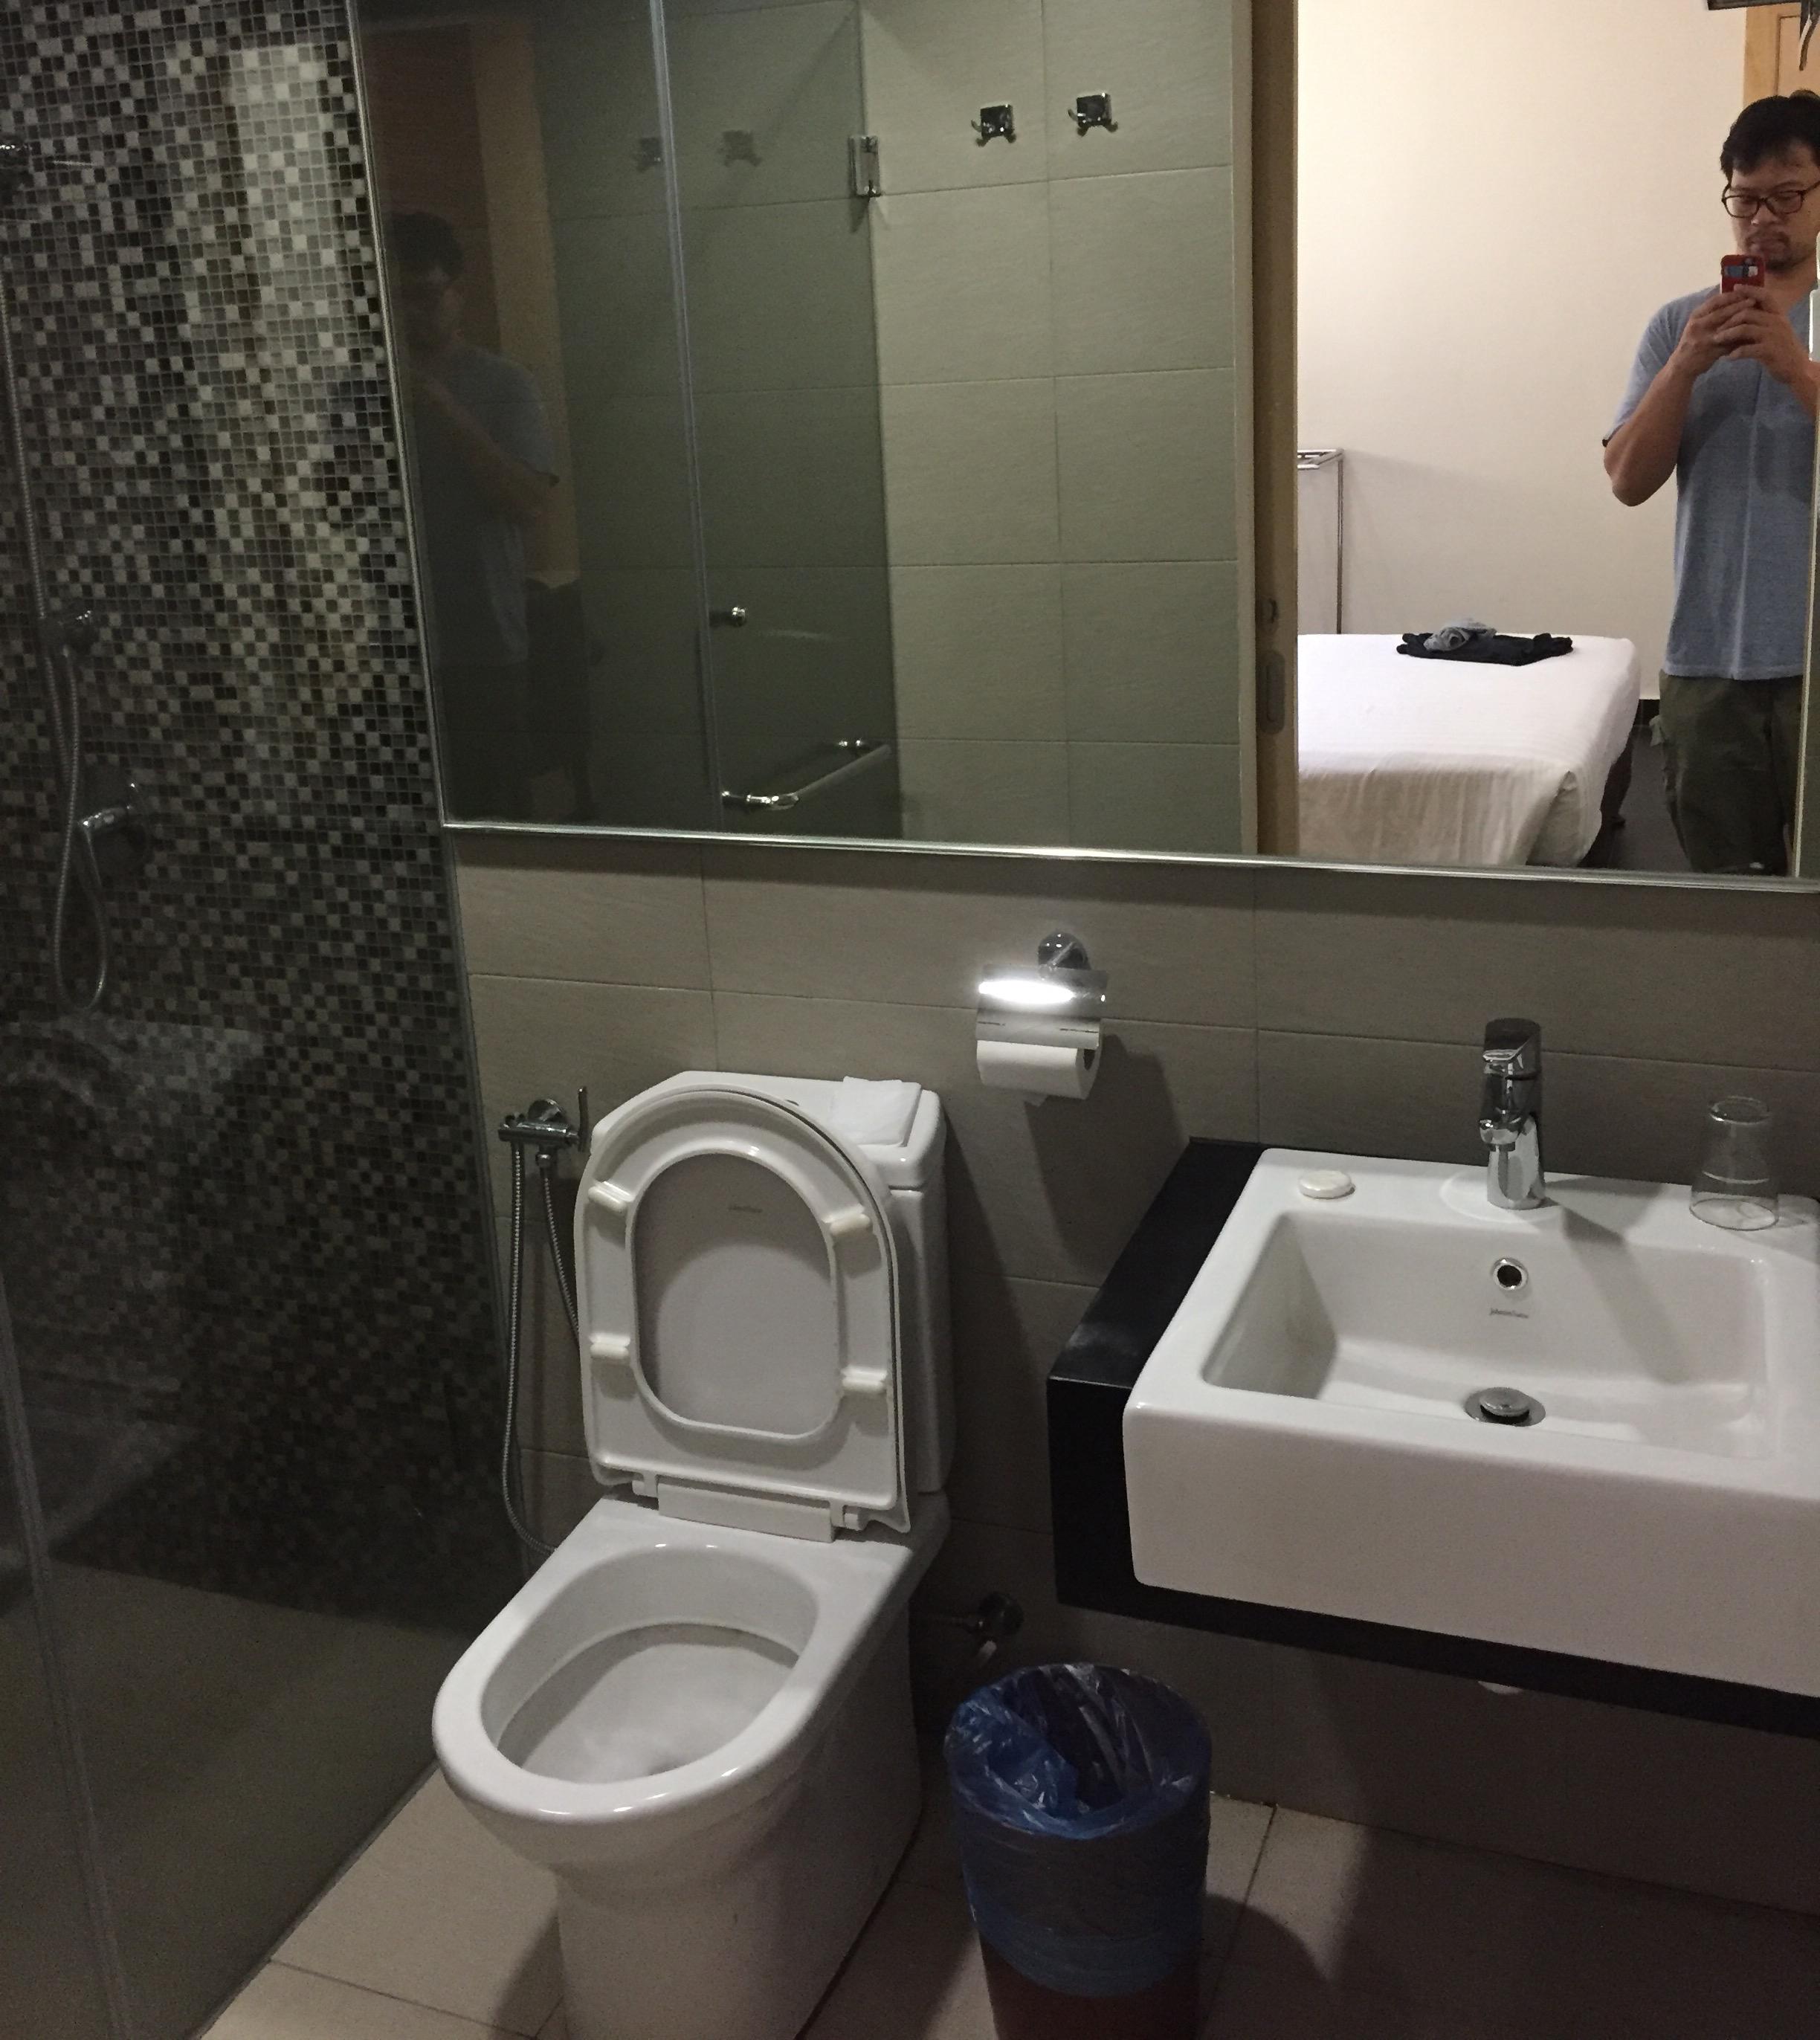 A nice decent bathroom...